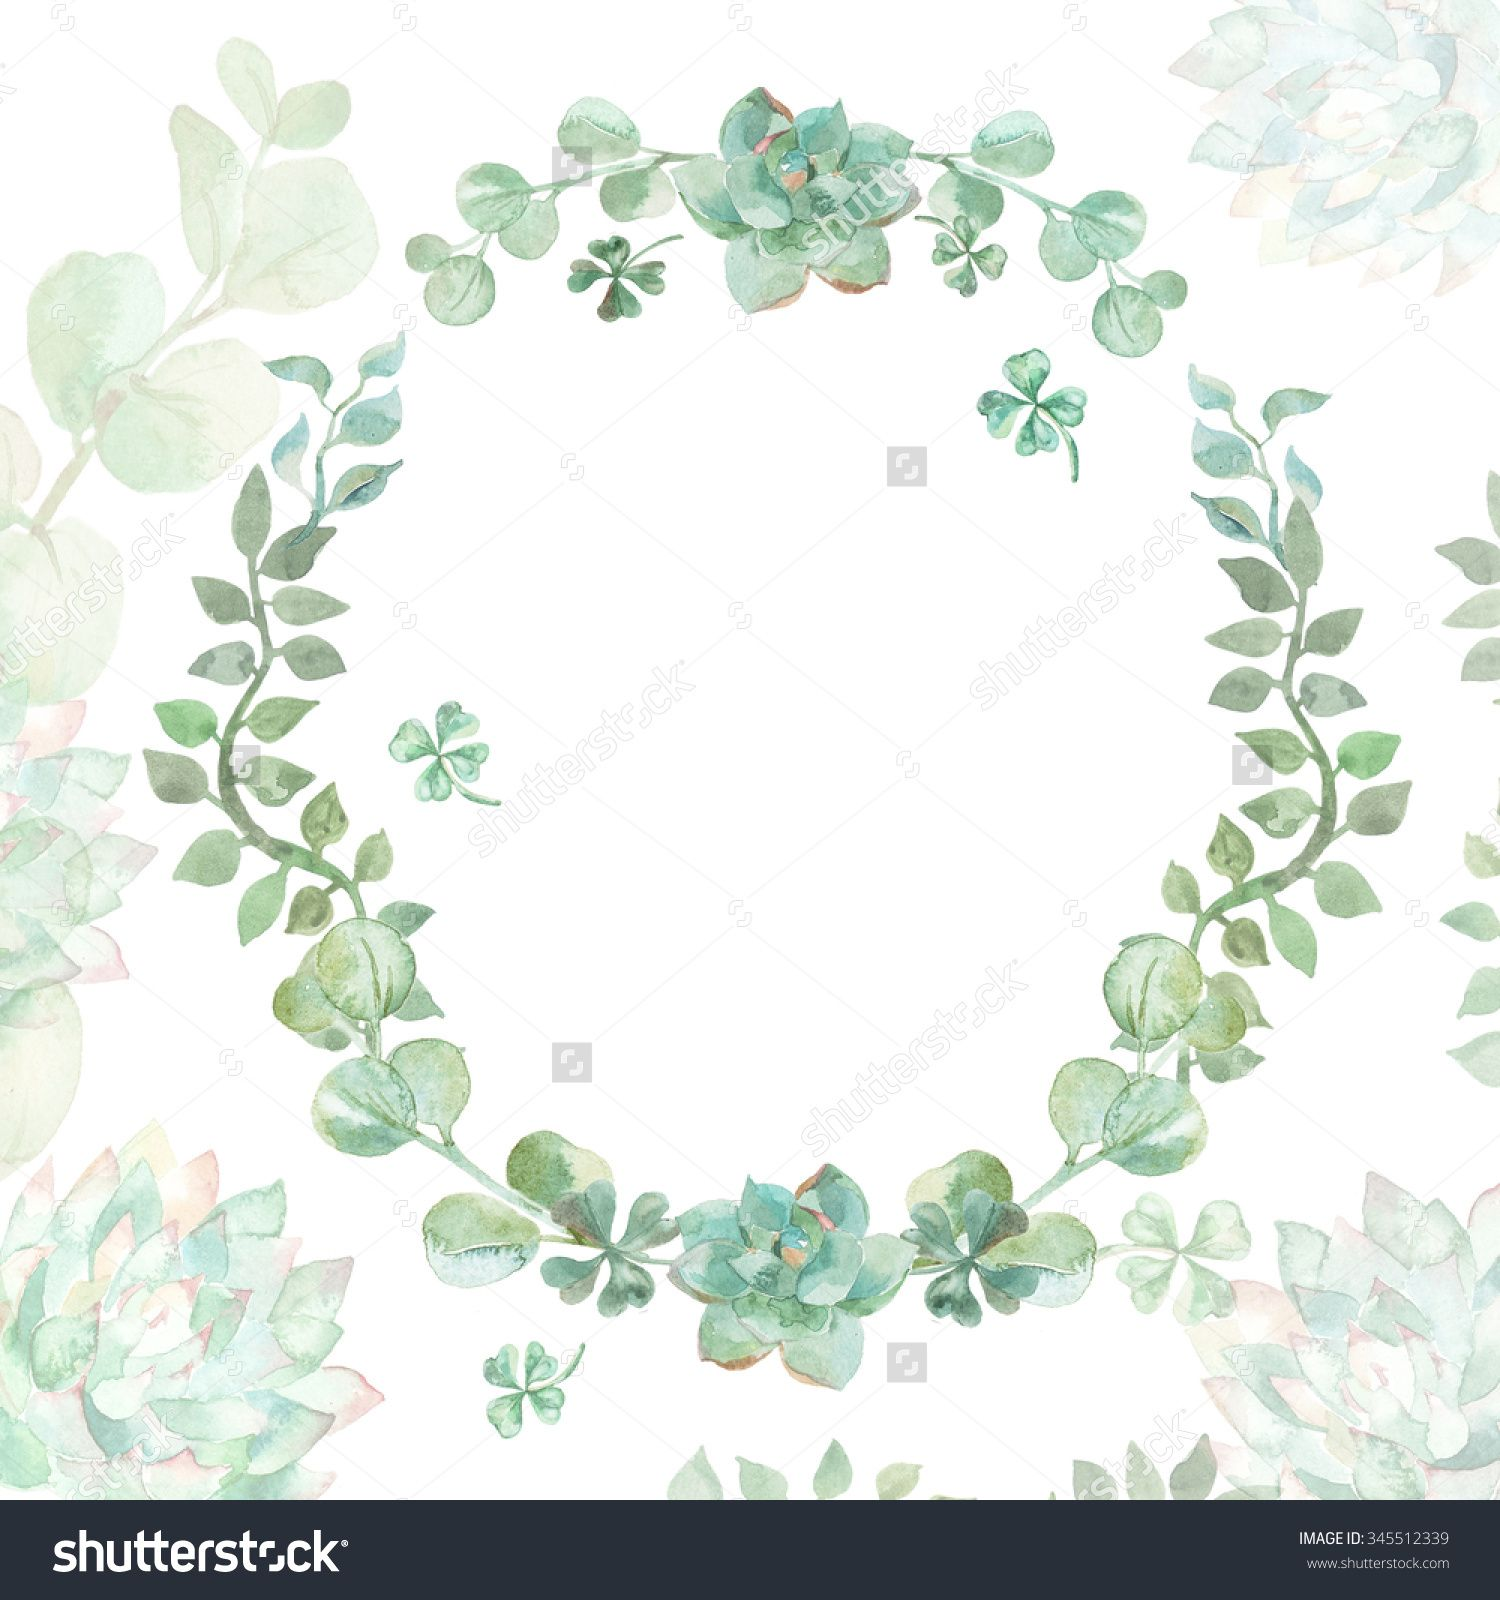 succulent wedding invitations Wedding invitation Wreath Succulents and eucalyptus Greeting card